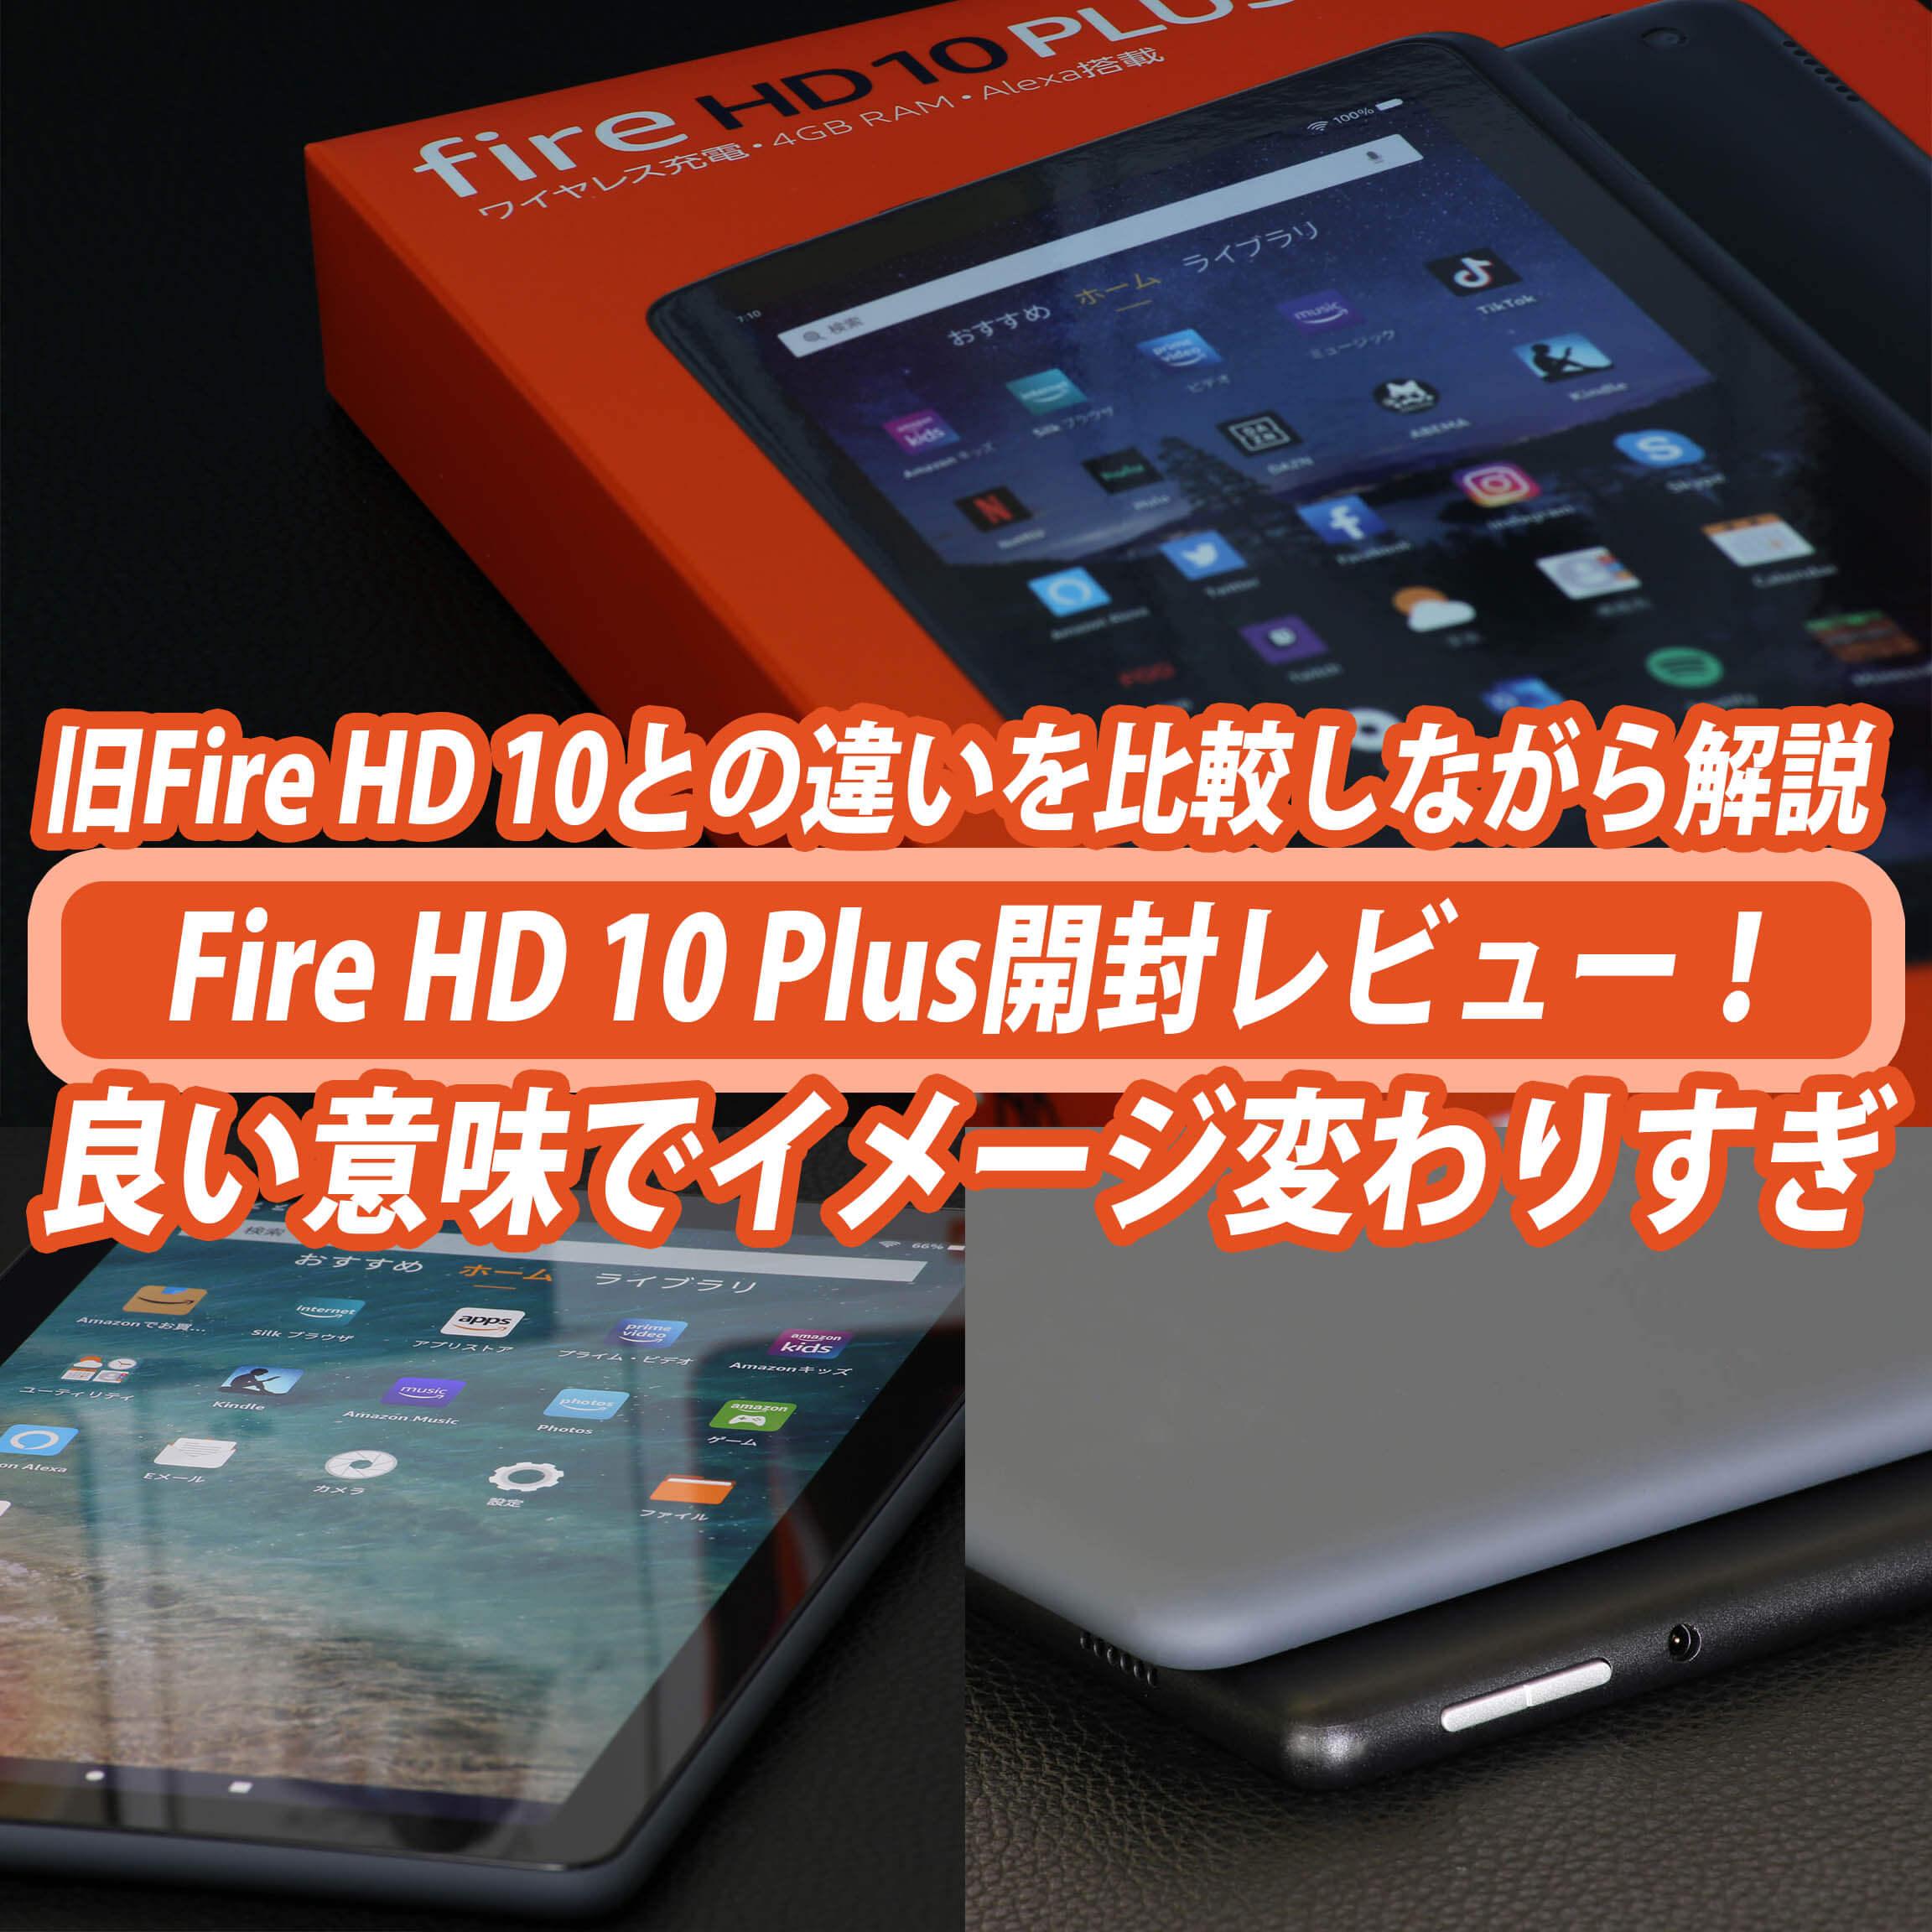 Fire HD 10 Plus開封レビュー